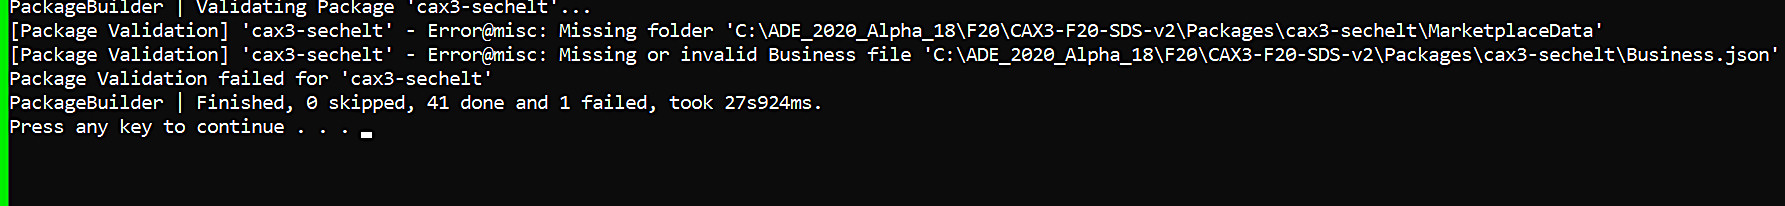 ade build error.jpg